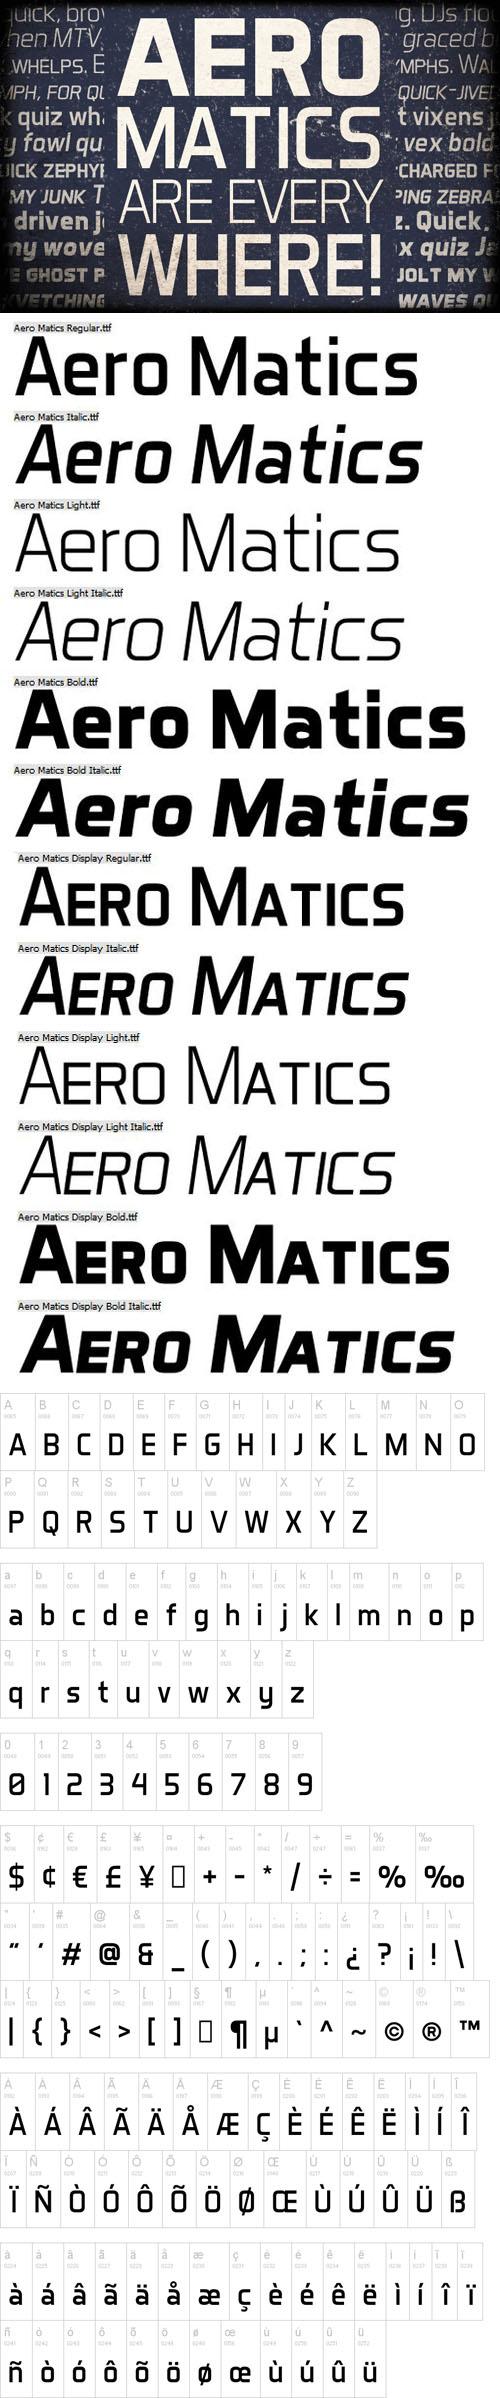 Aero Matics Font [12-Weights]